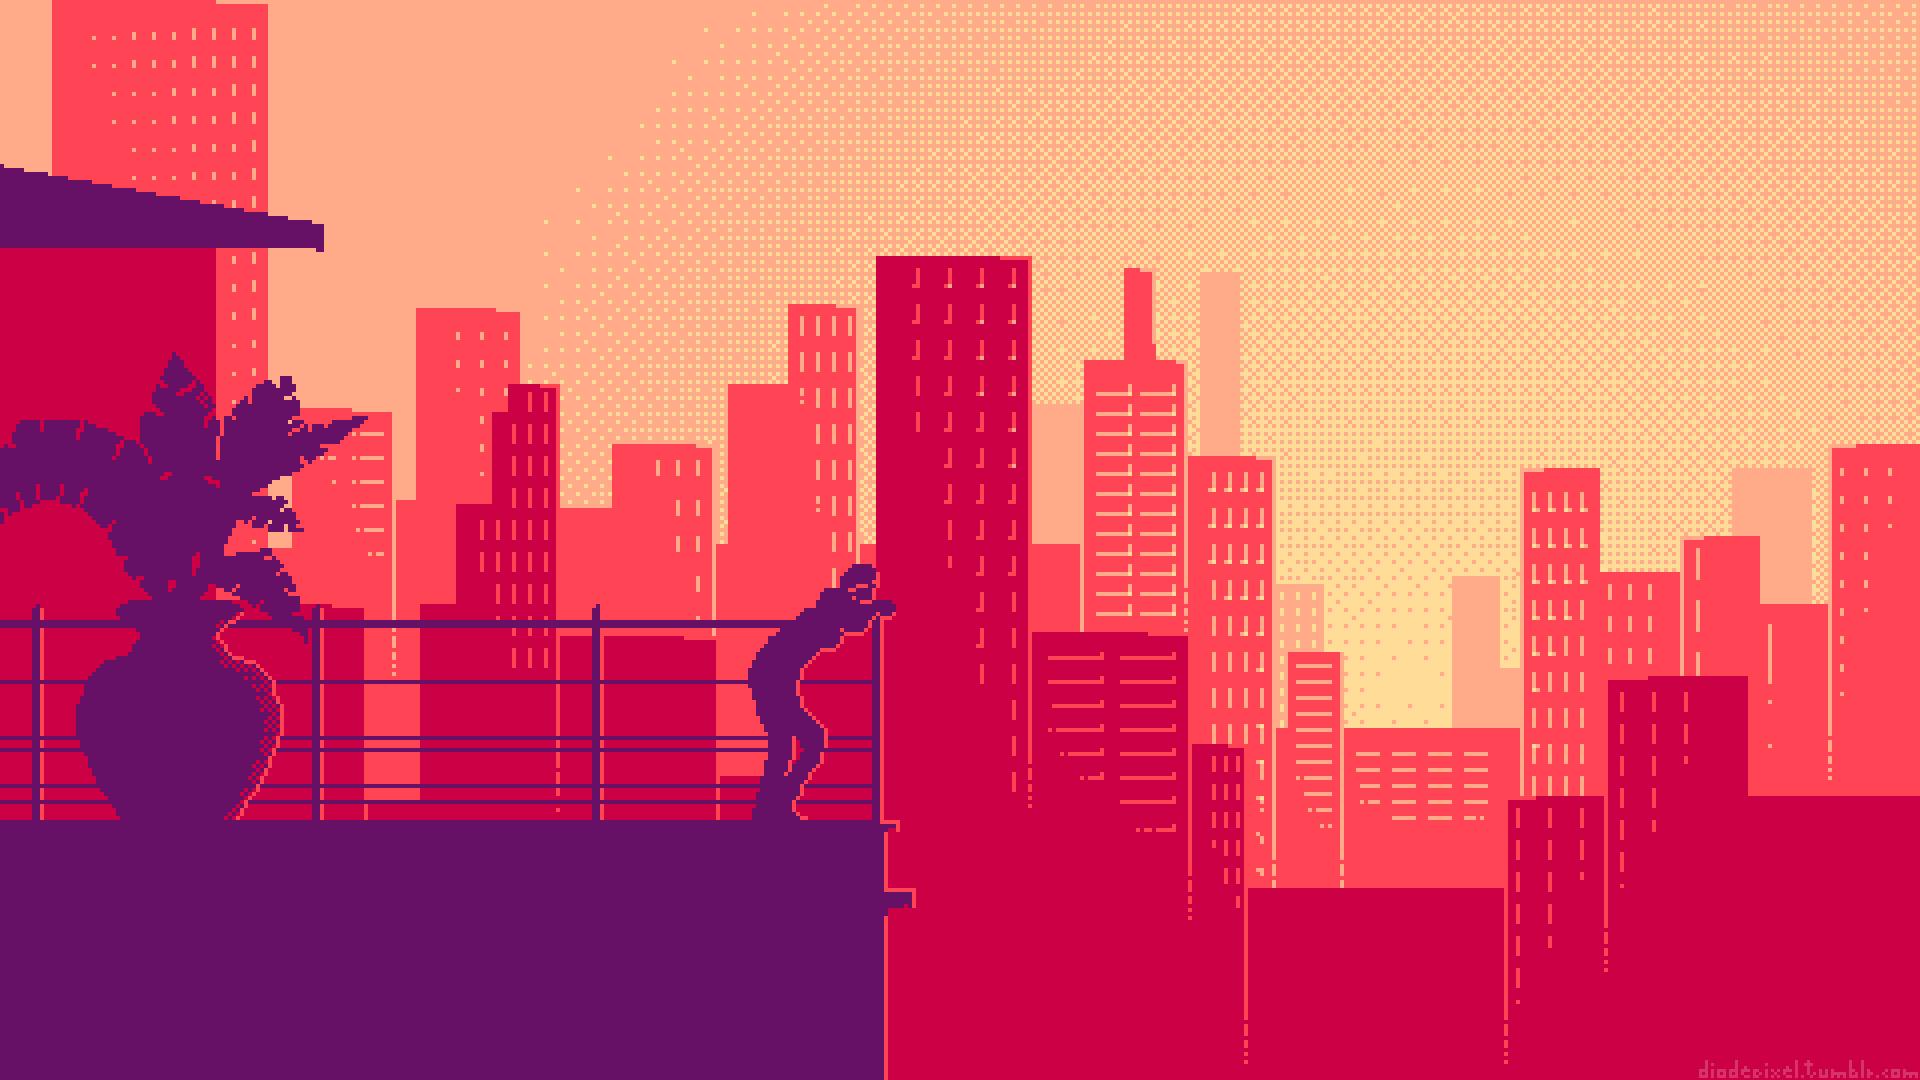 Pixel Art HD Wallpaper